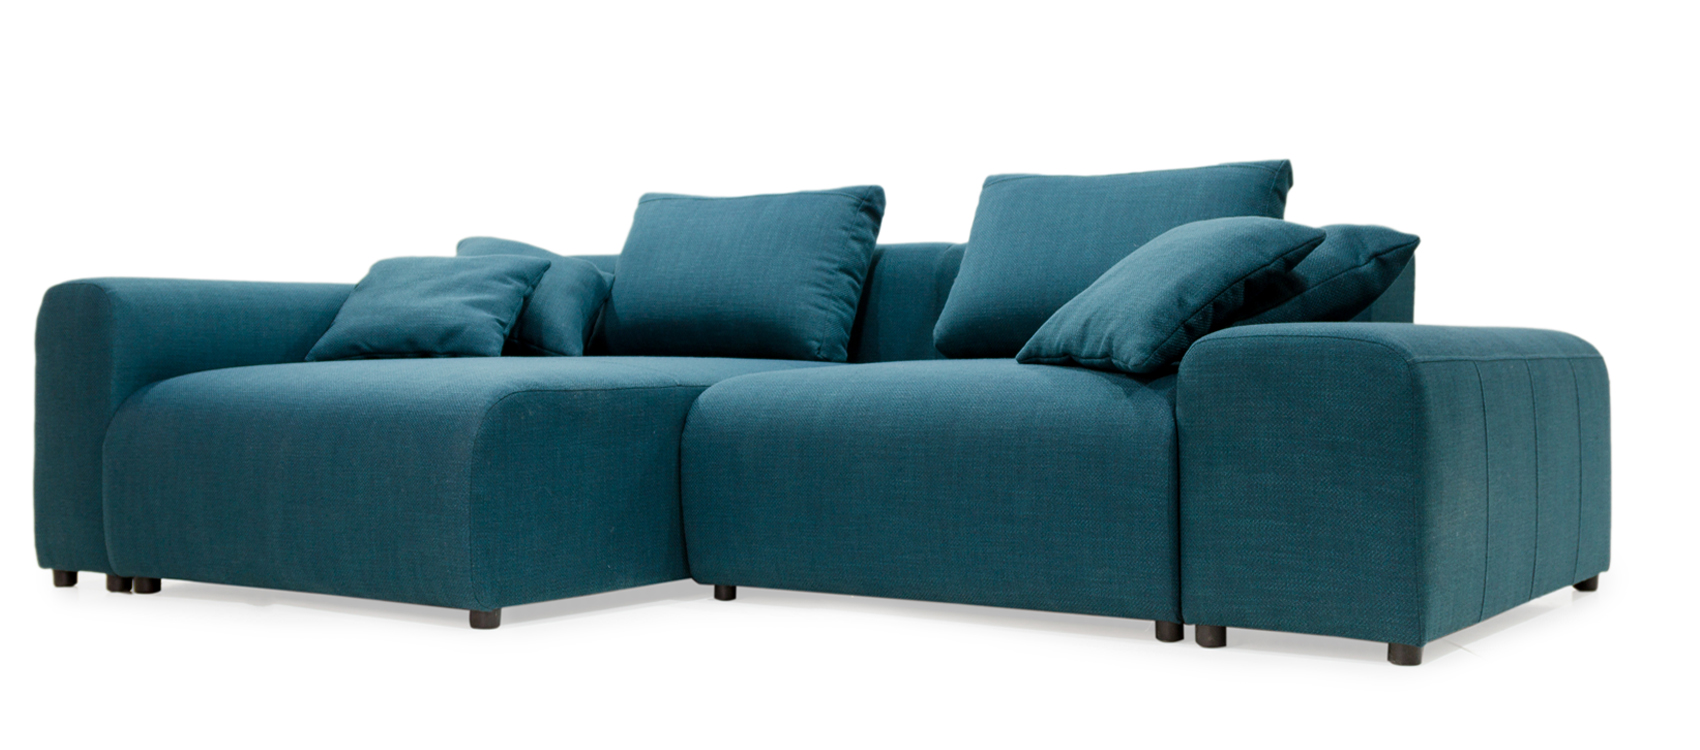 Sofa RAFT фото 2